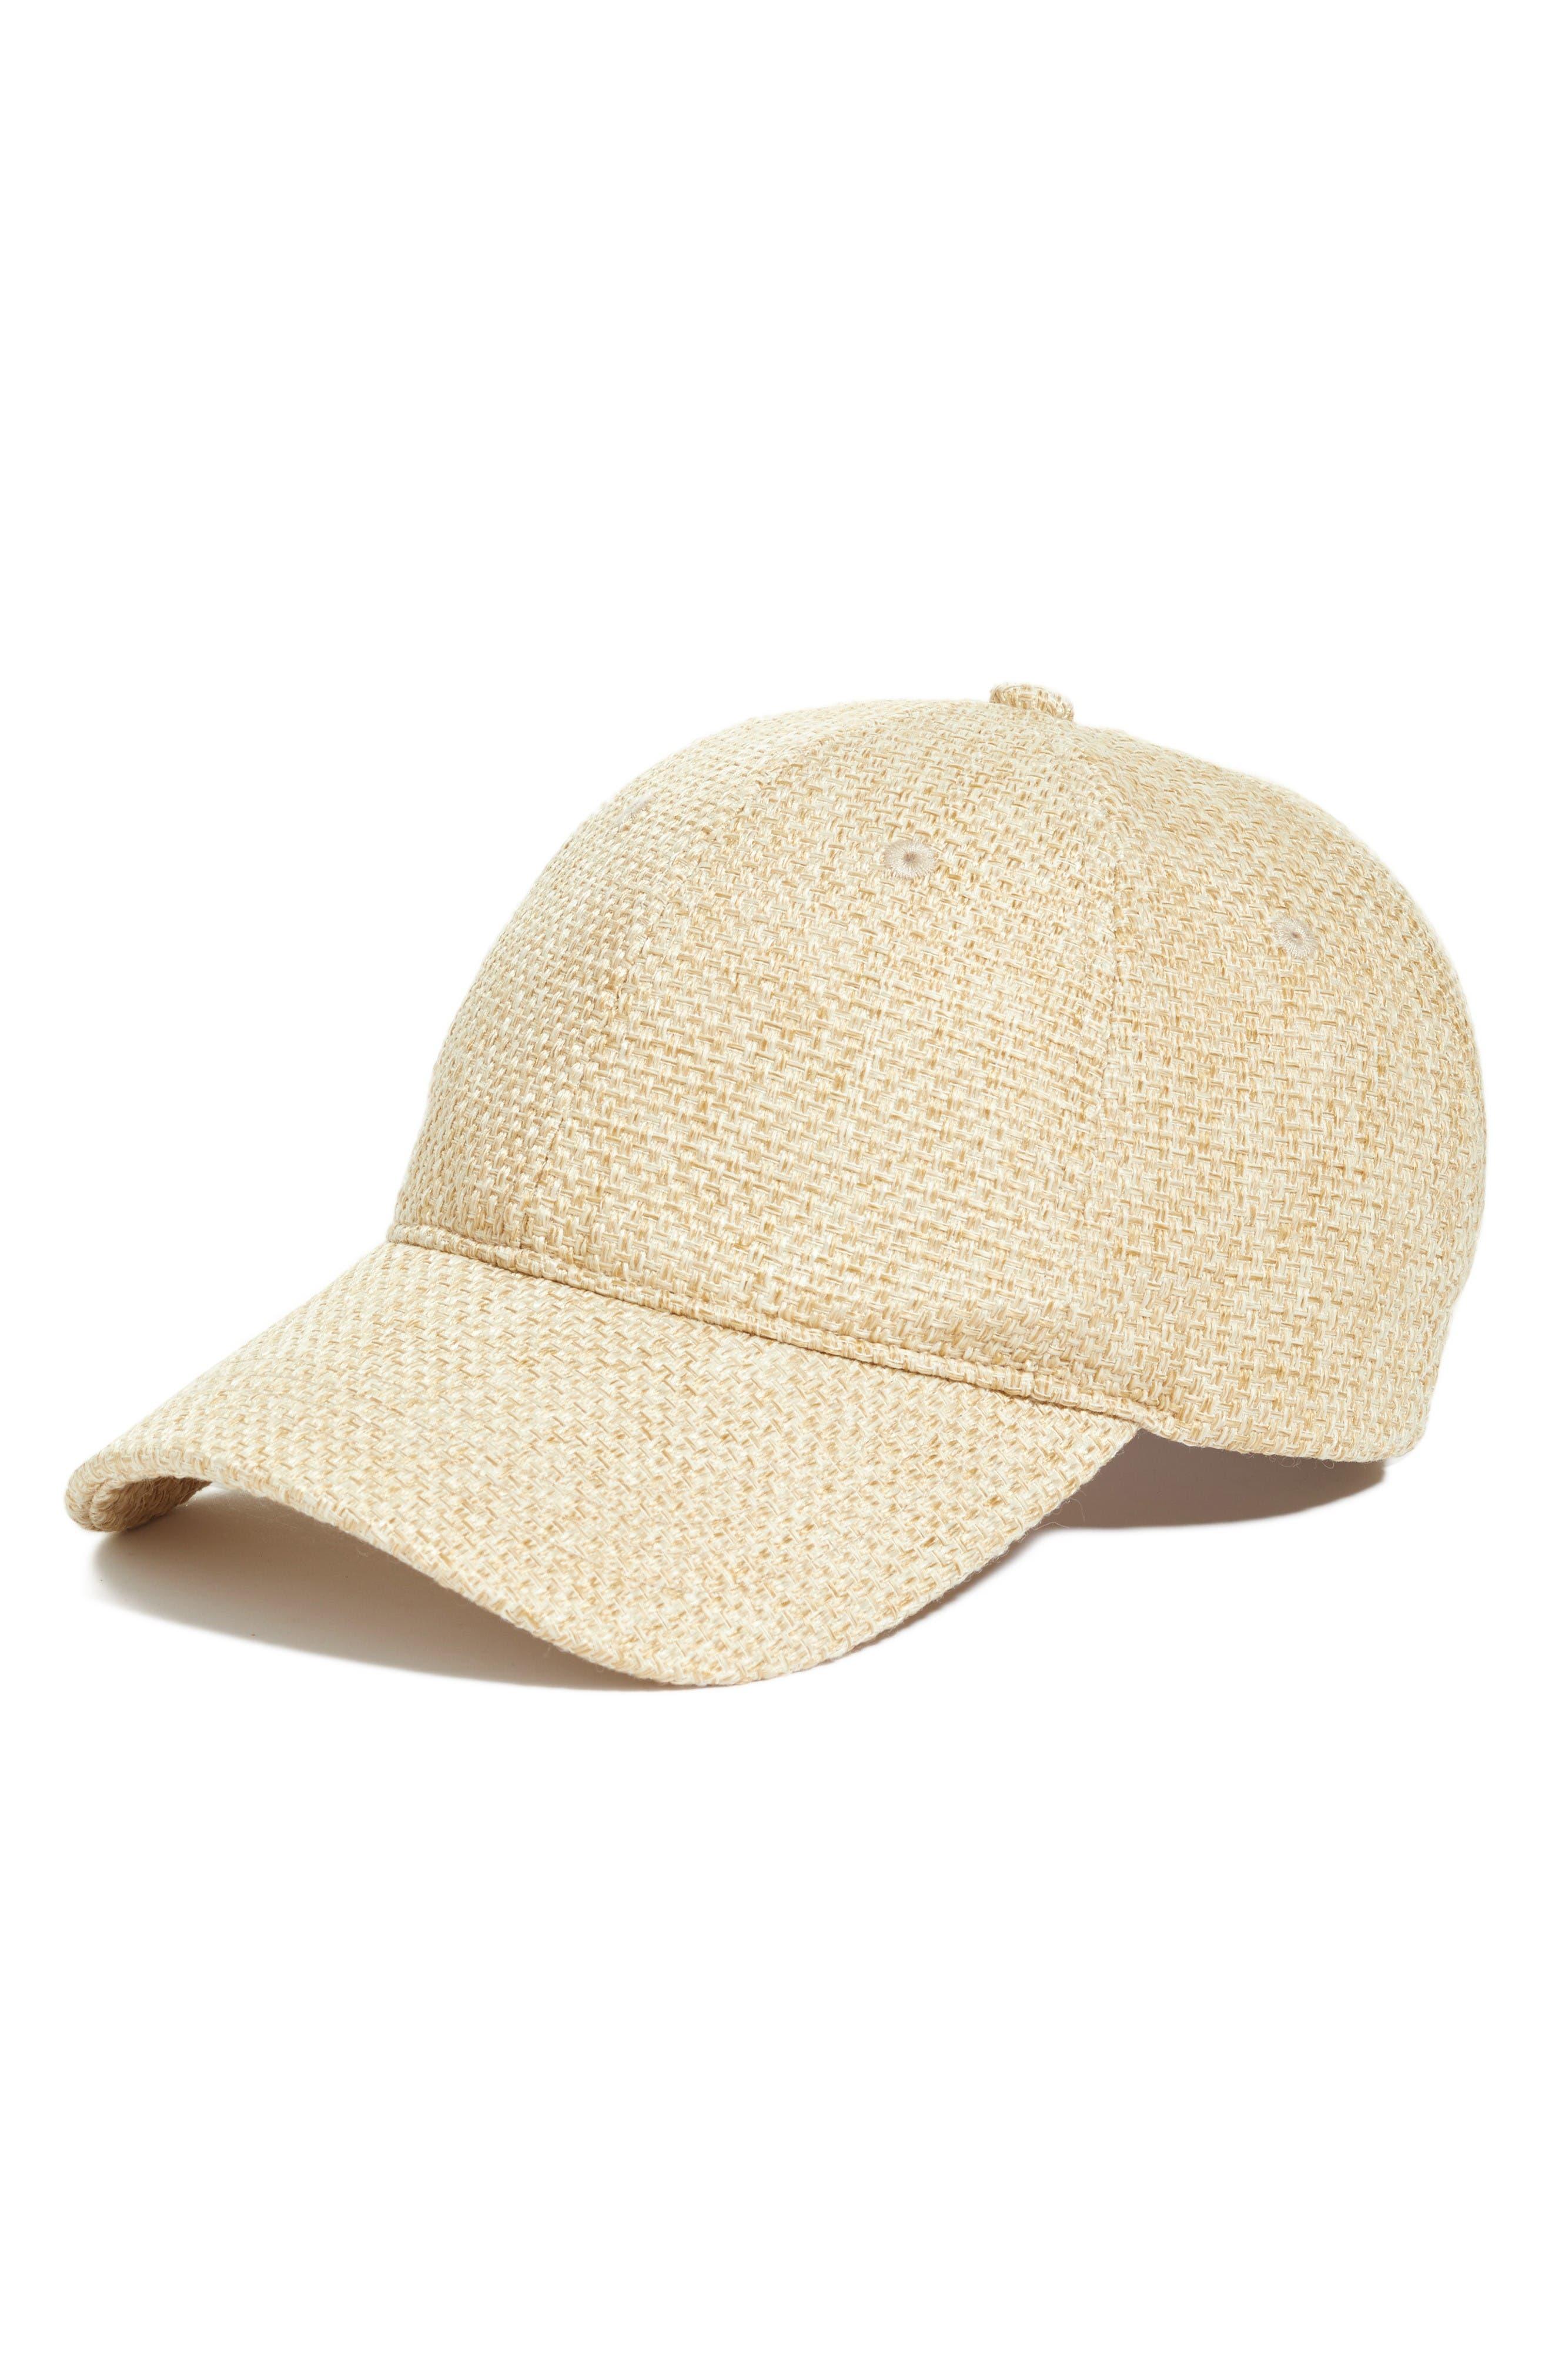 Alternate Image 1 Selected - Treasure & Bond Straw Baseball Cap